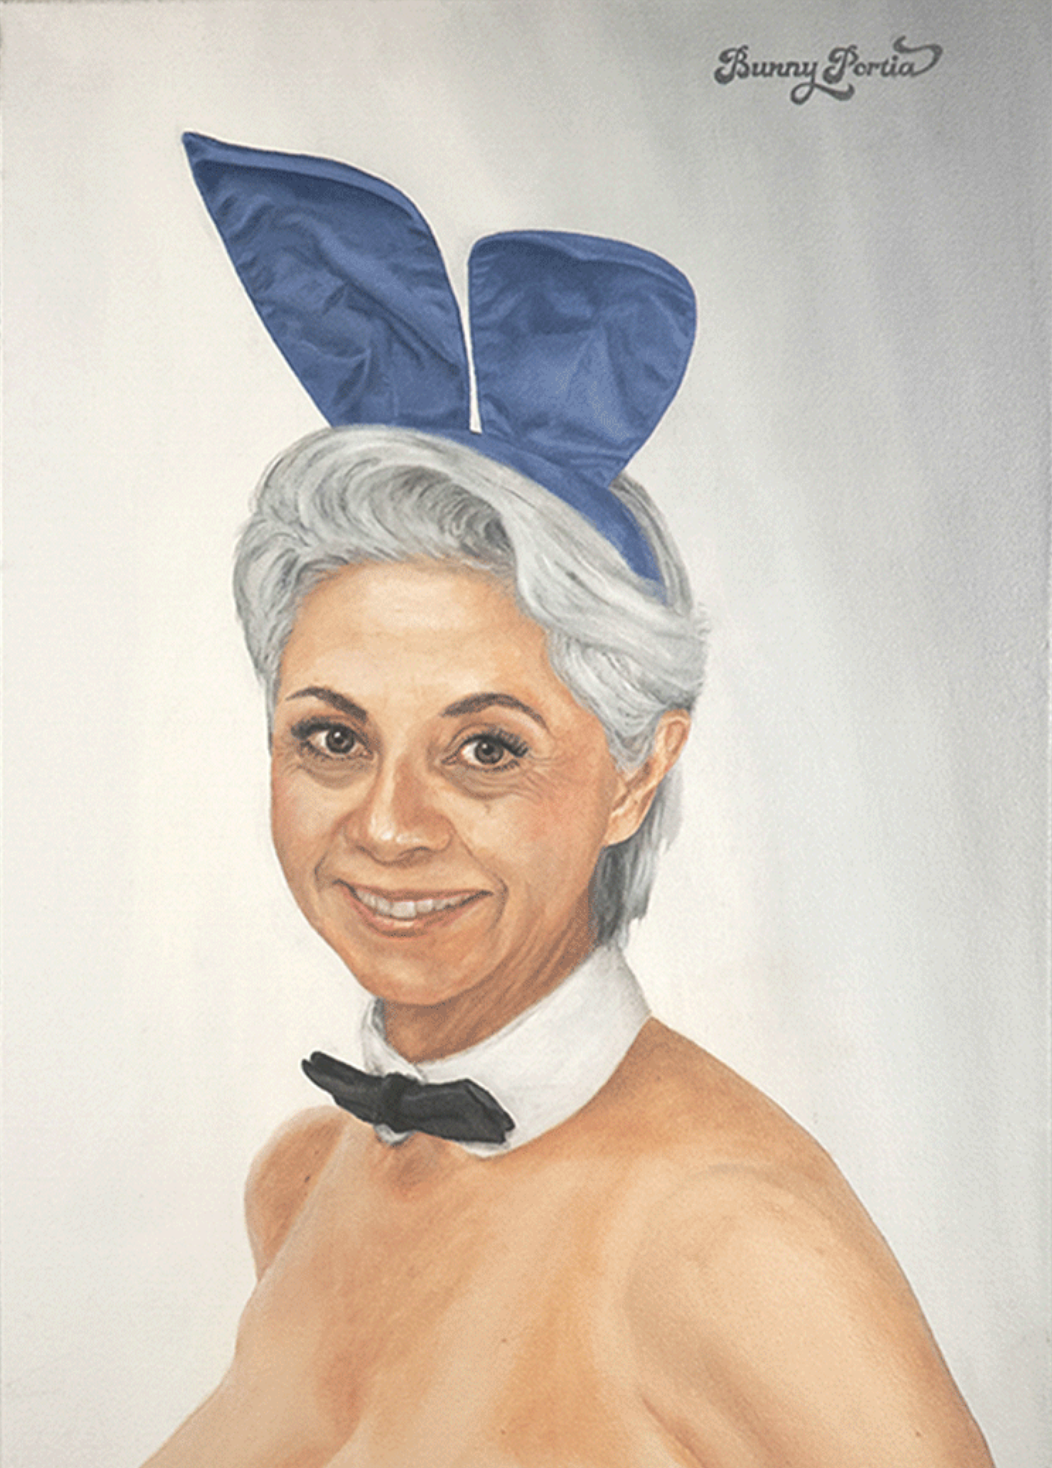 Bunny Portia - PAINTER